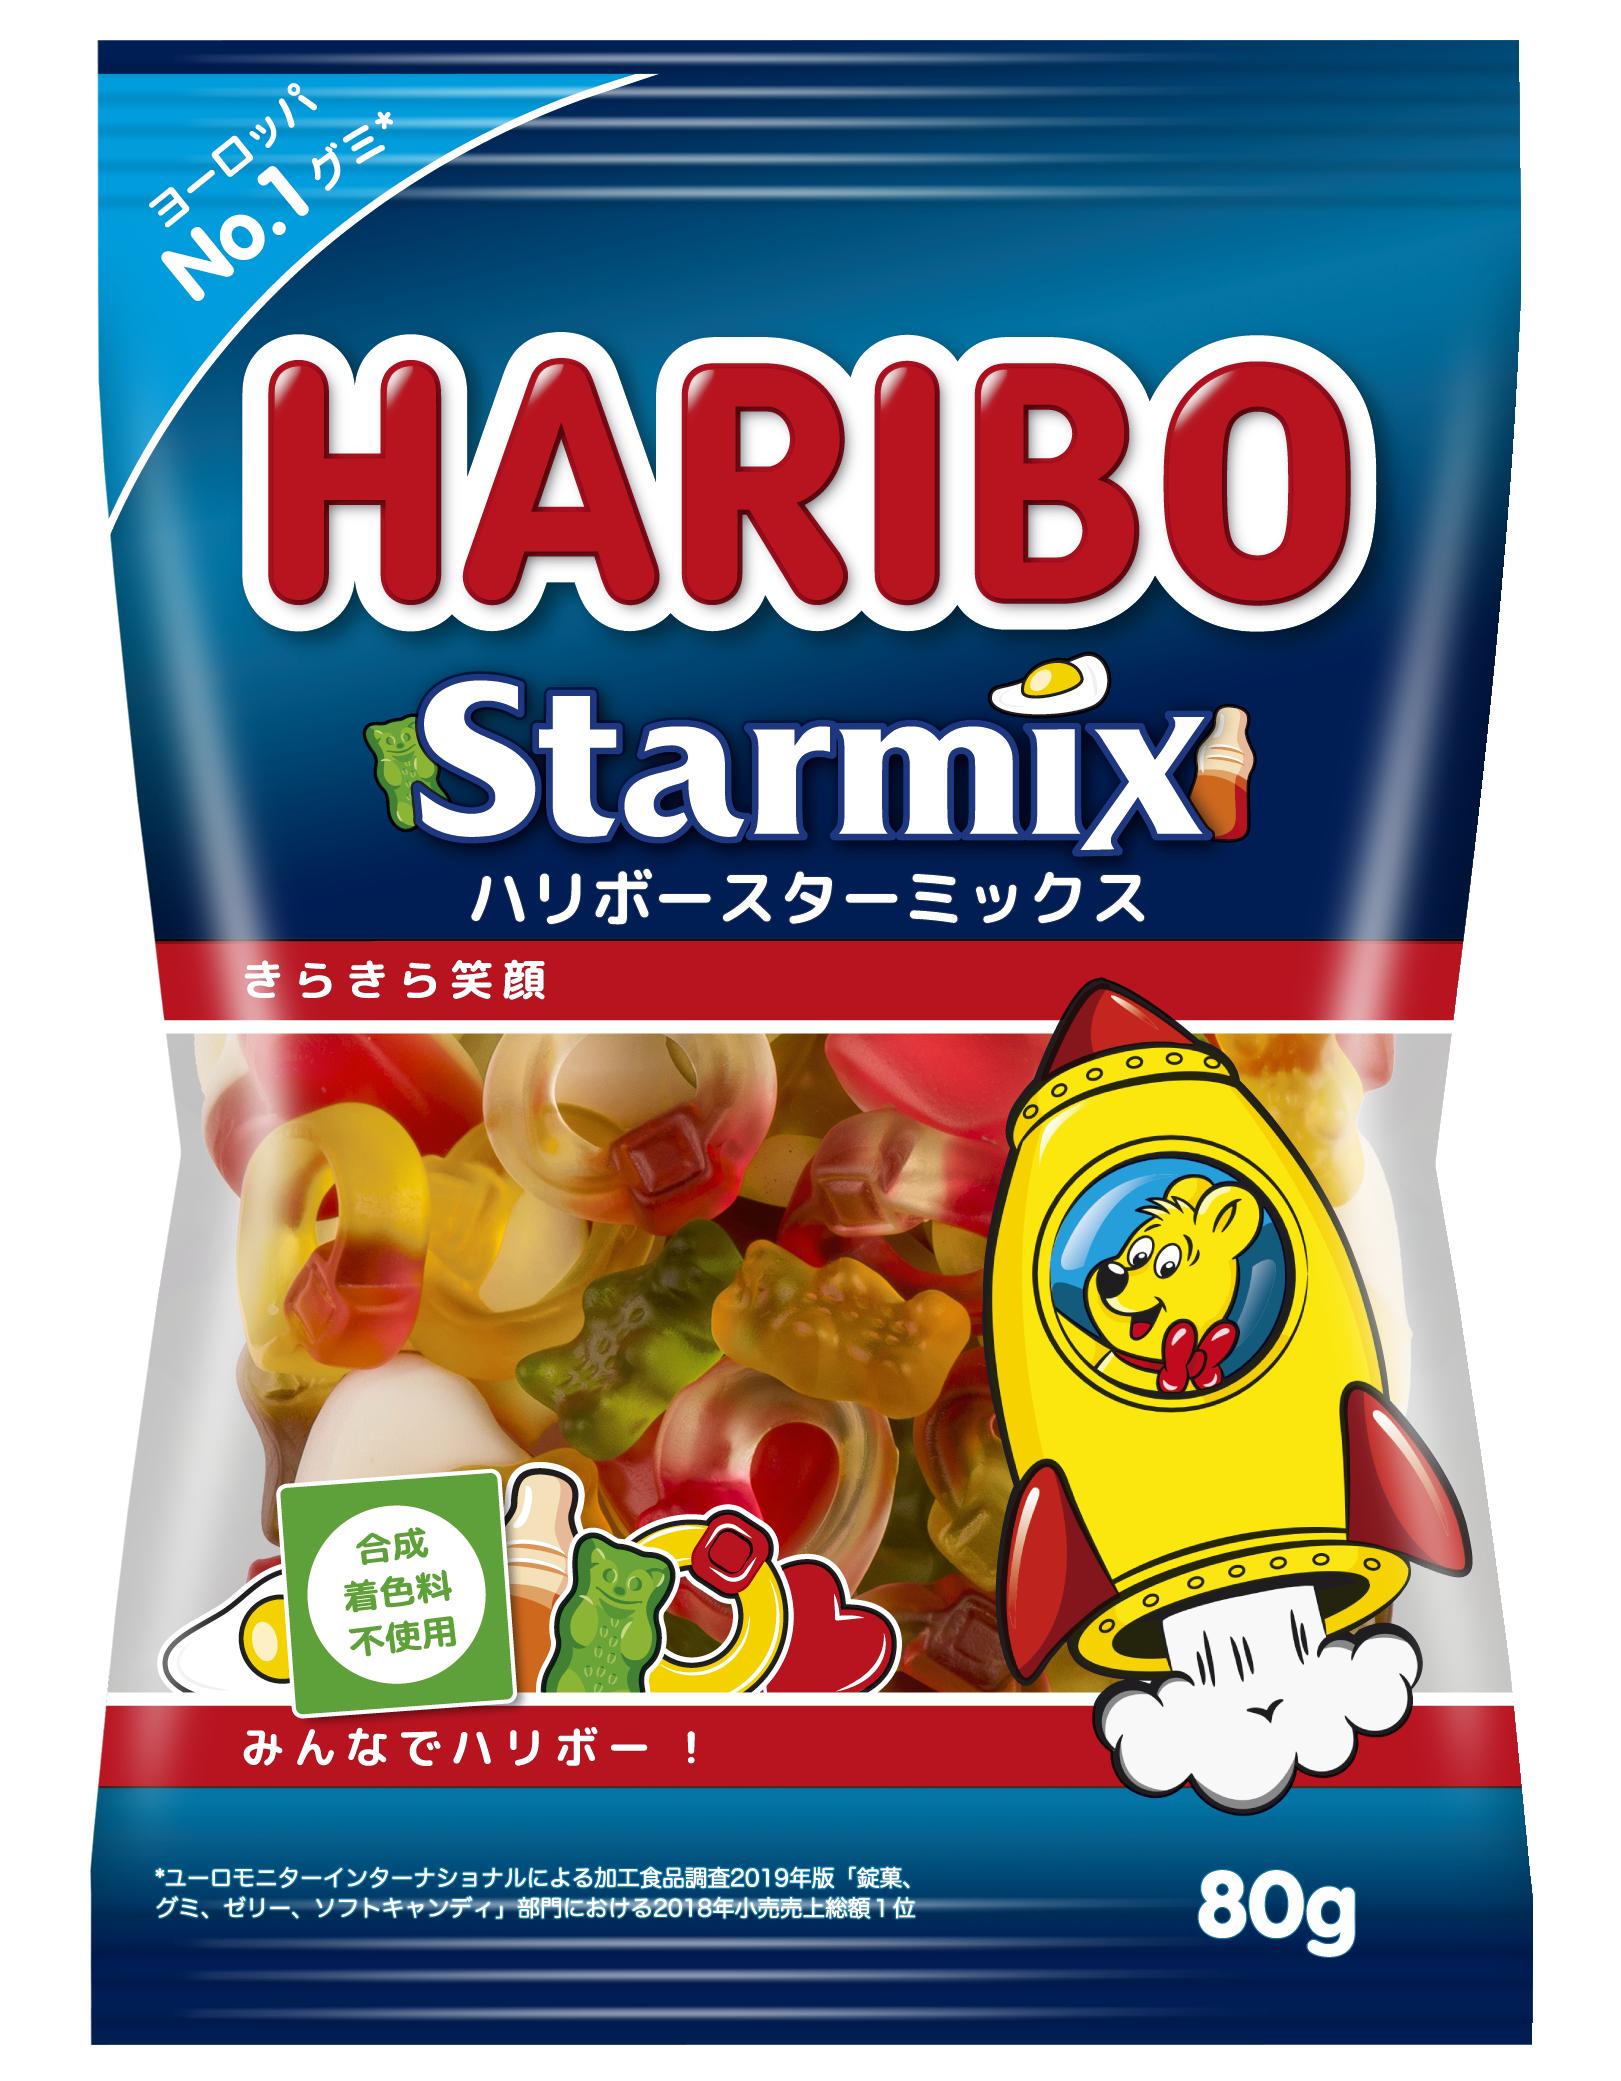 Bag of HARIBO Starmix